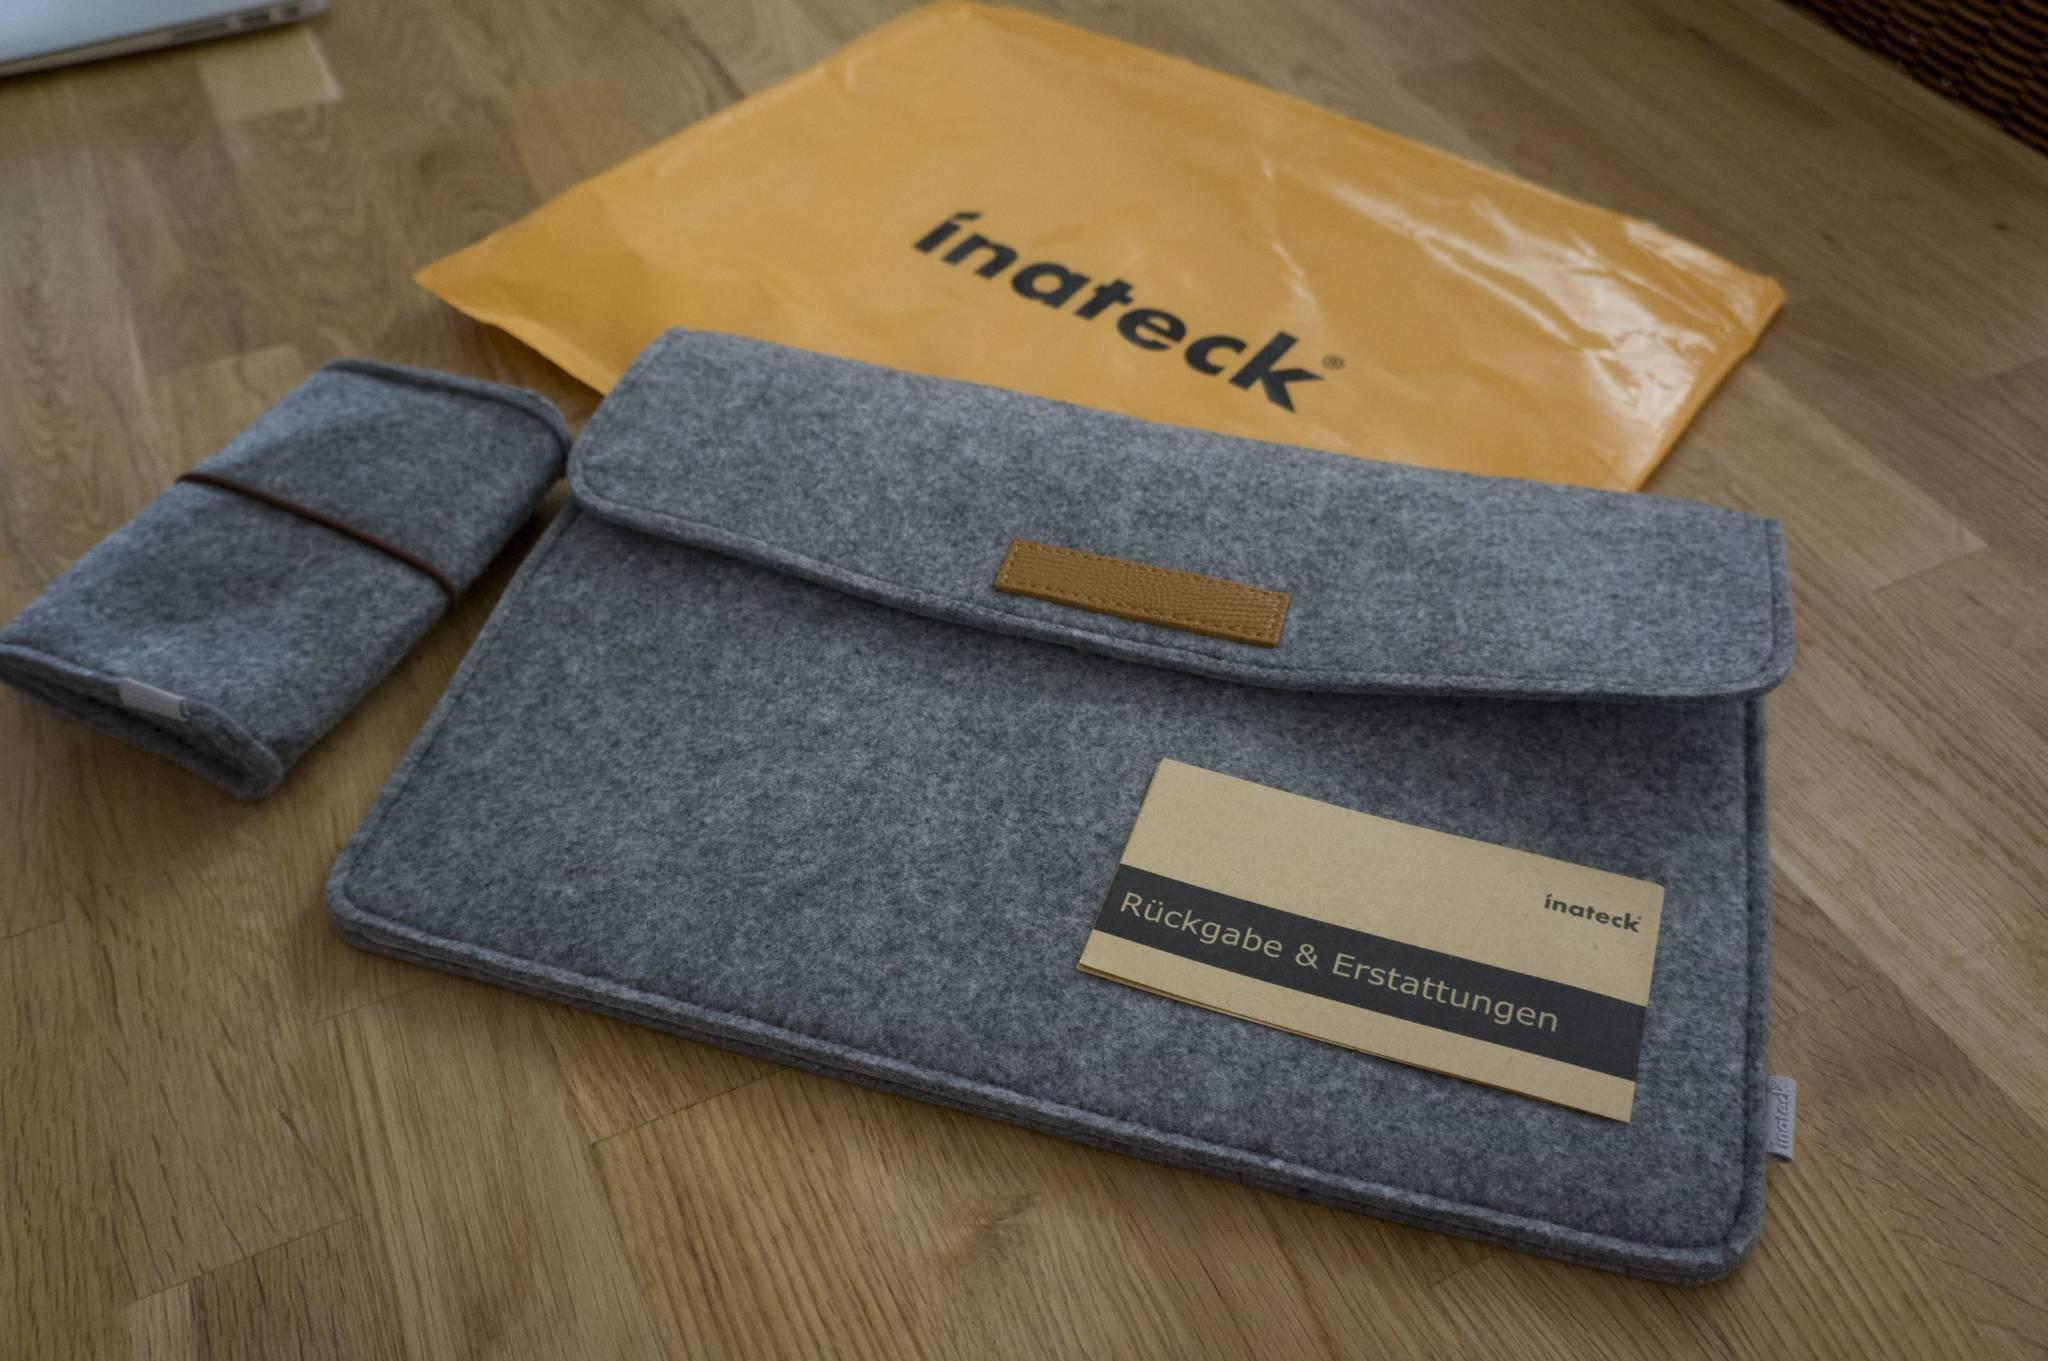 Erfahrungsbericht – Inateck Macbook Pro Retina 13.3″ Filz Sleeve